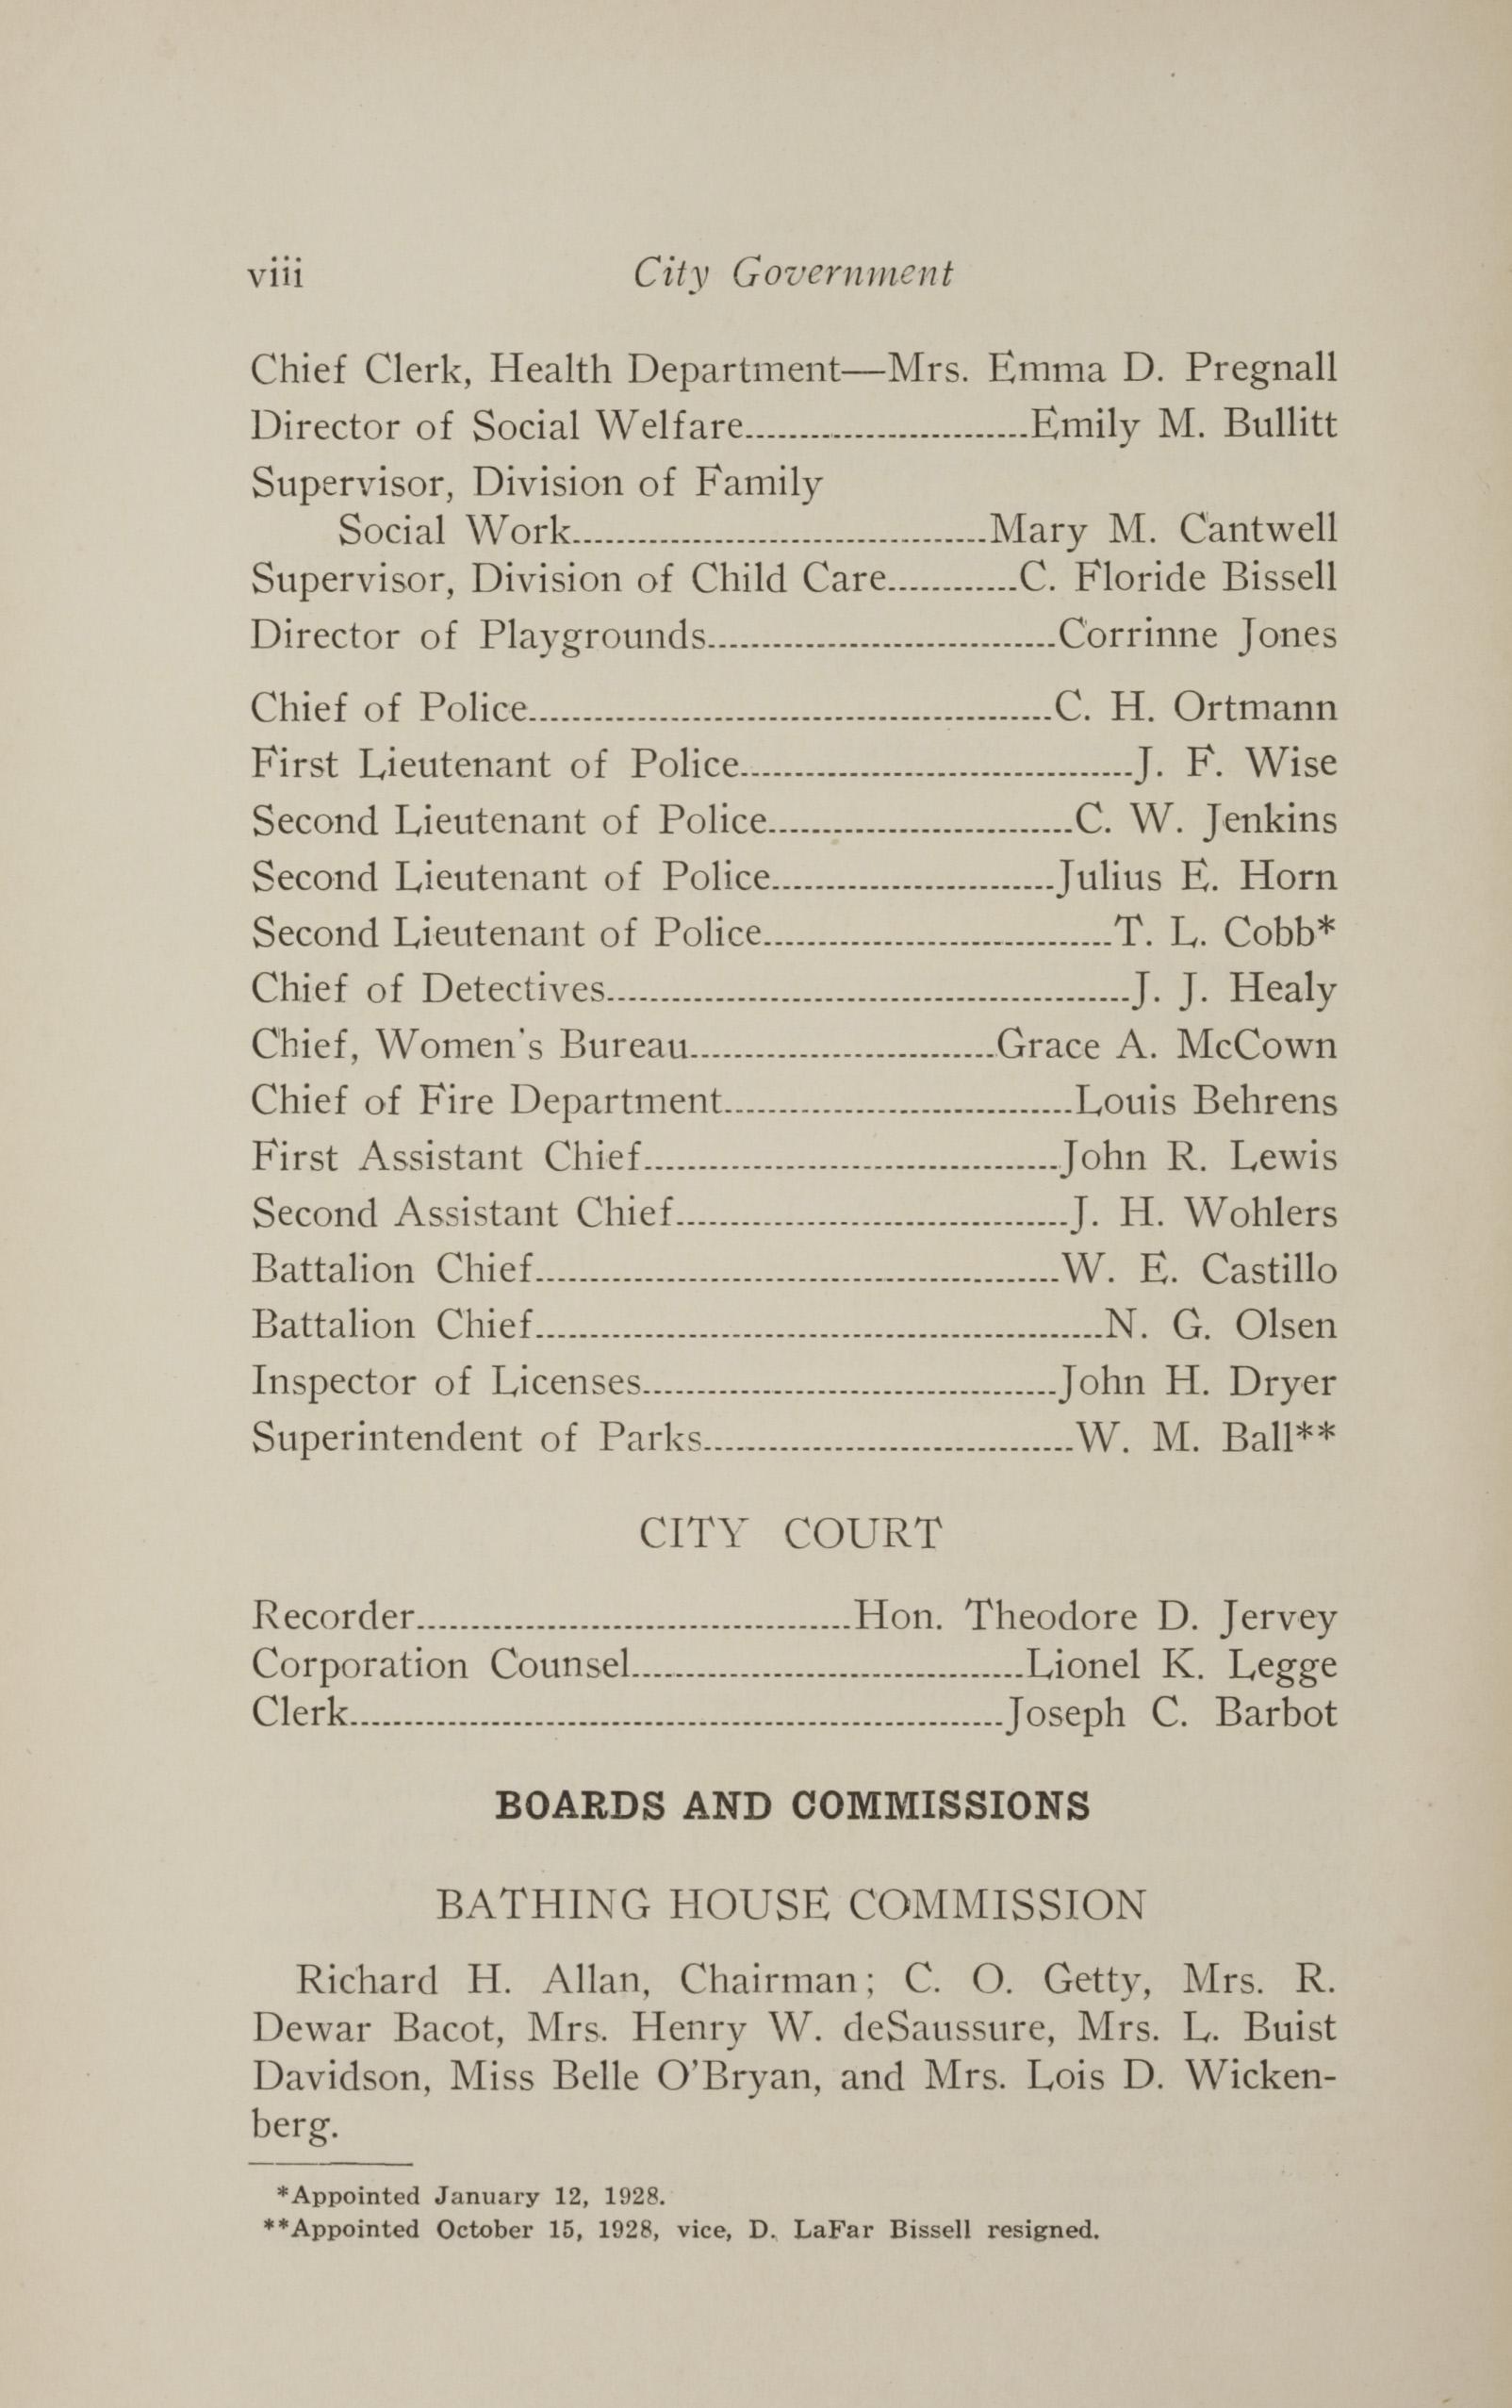 Charleston Yearbook, 1928, page viii